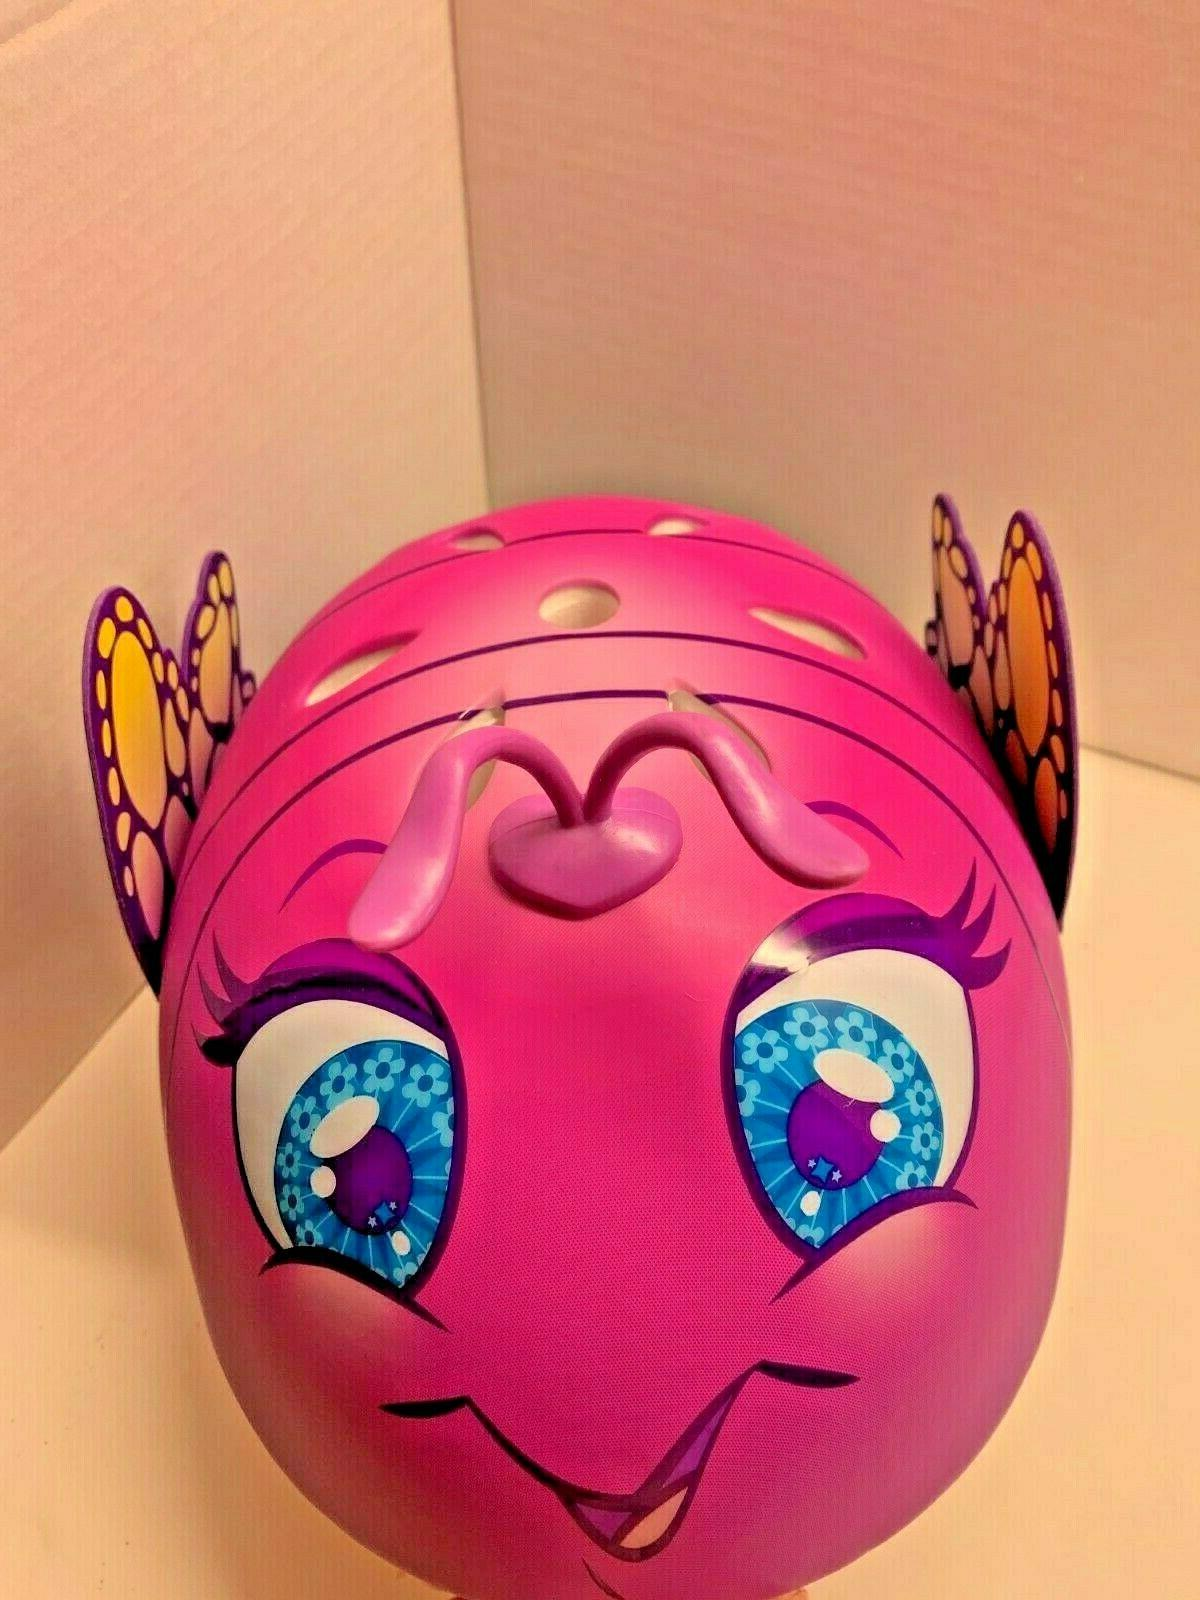 New Child Helmet Ages 3-5 48-52